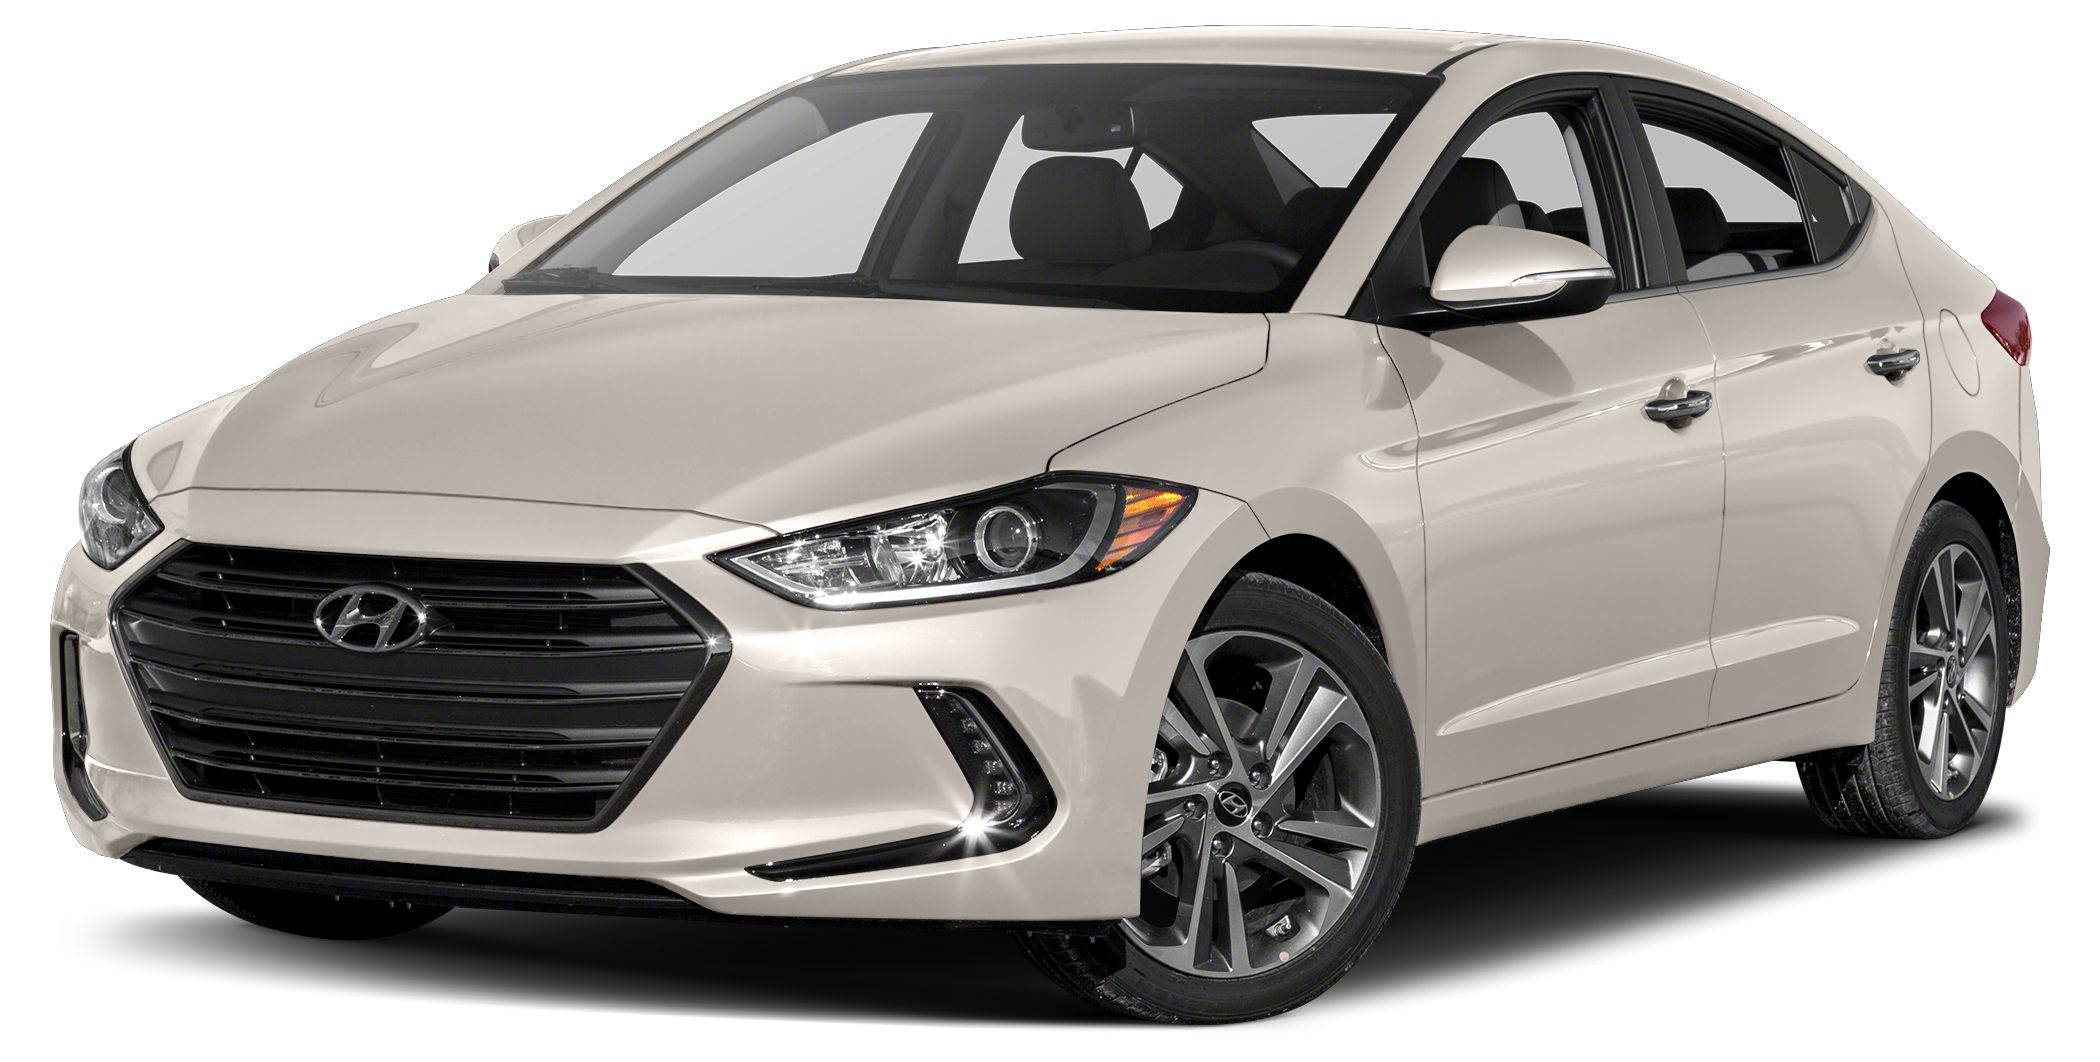 2017 Hyundai Elantra Limited Miles 11Color Phantom Black Stock 14482 VIN 5NPD84LF1HH048798